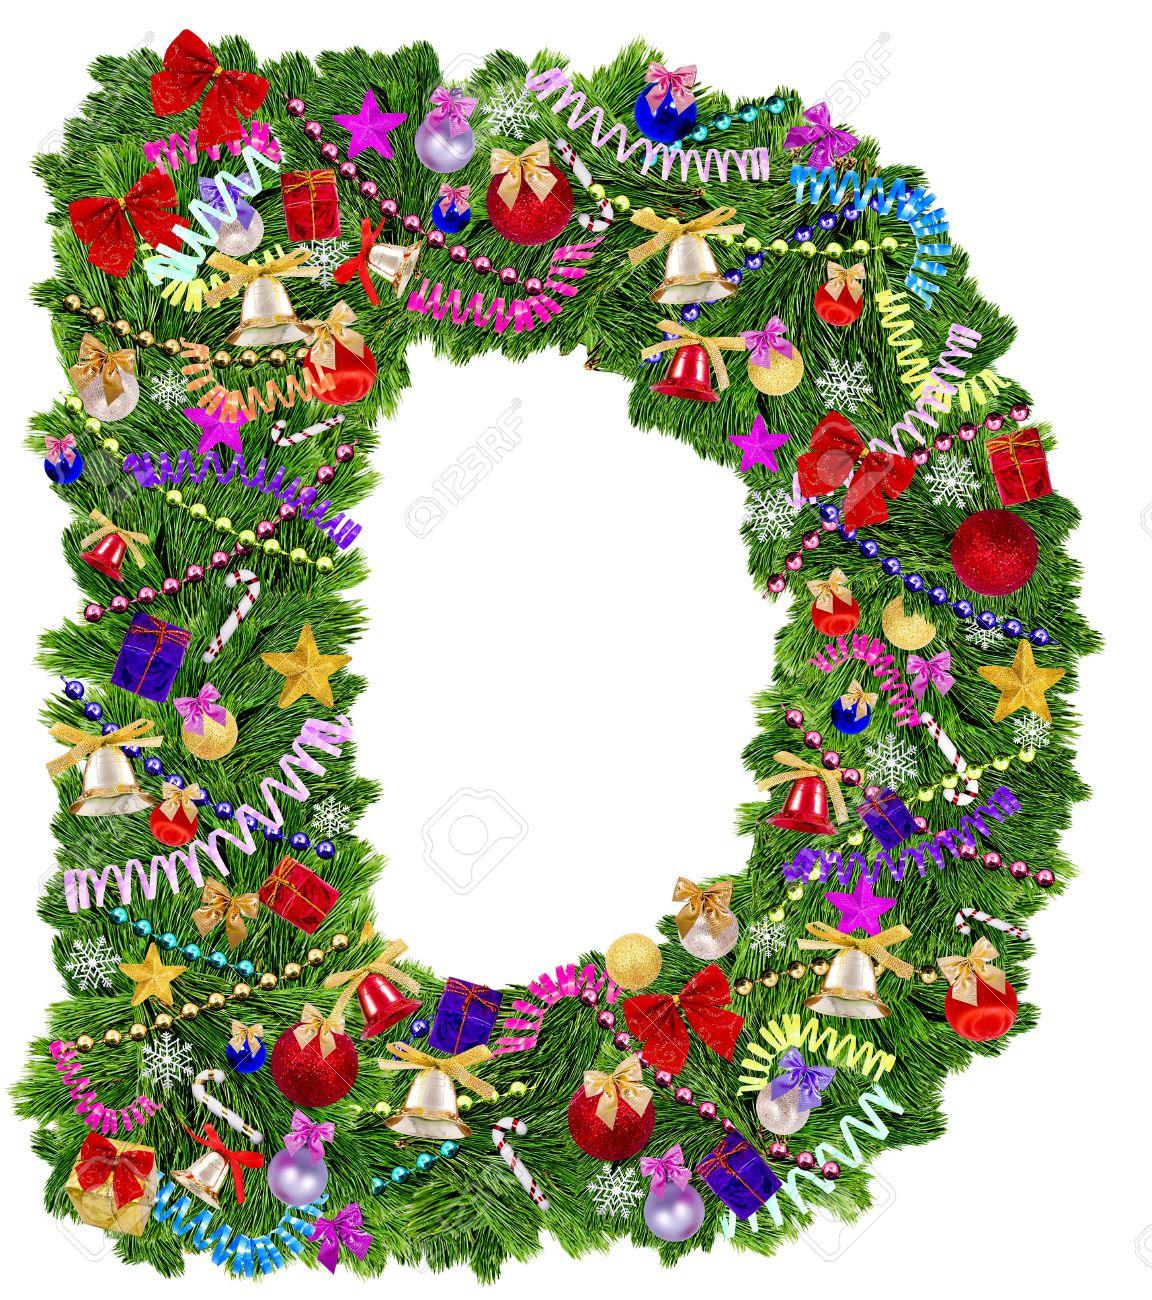 Oslikaj slova  azbuke - Page 21 16265793-Letter-D-Christmas-tree-decoration-on-a-white-background-Stock-Photo